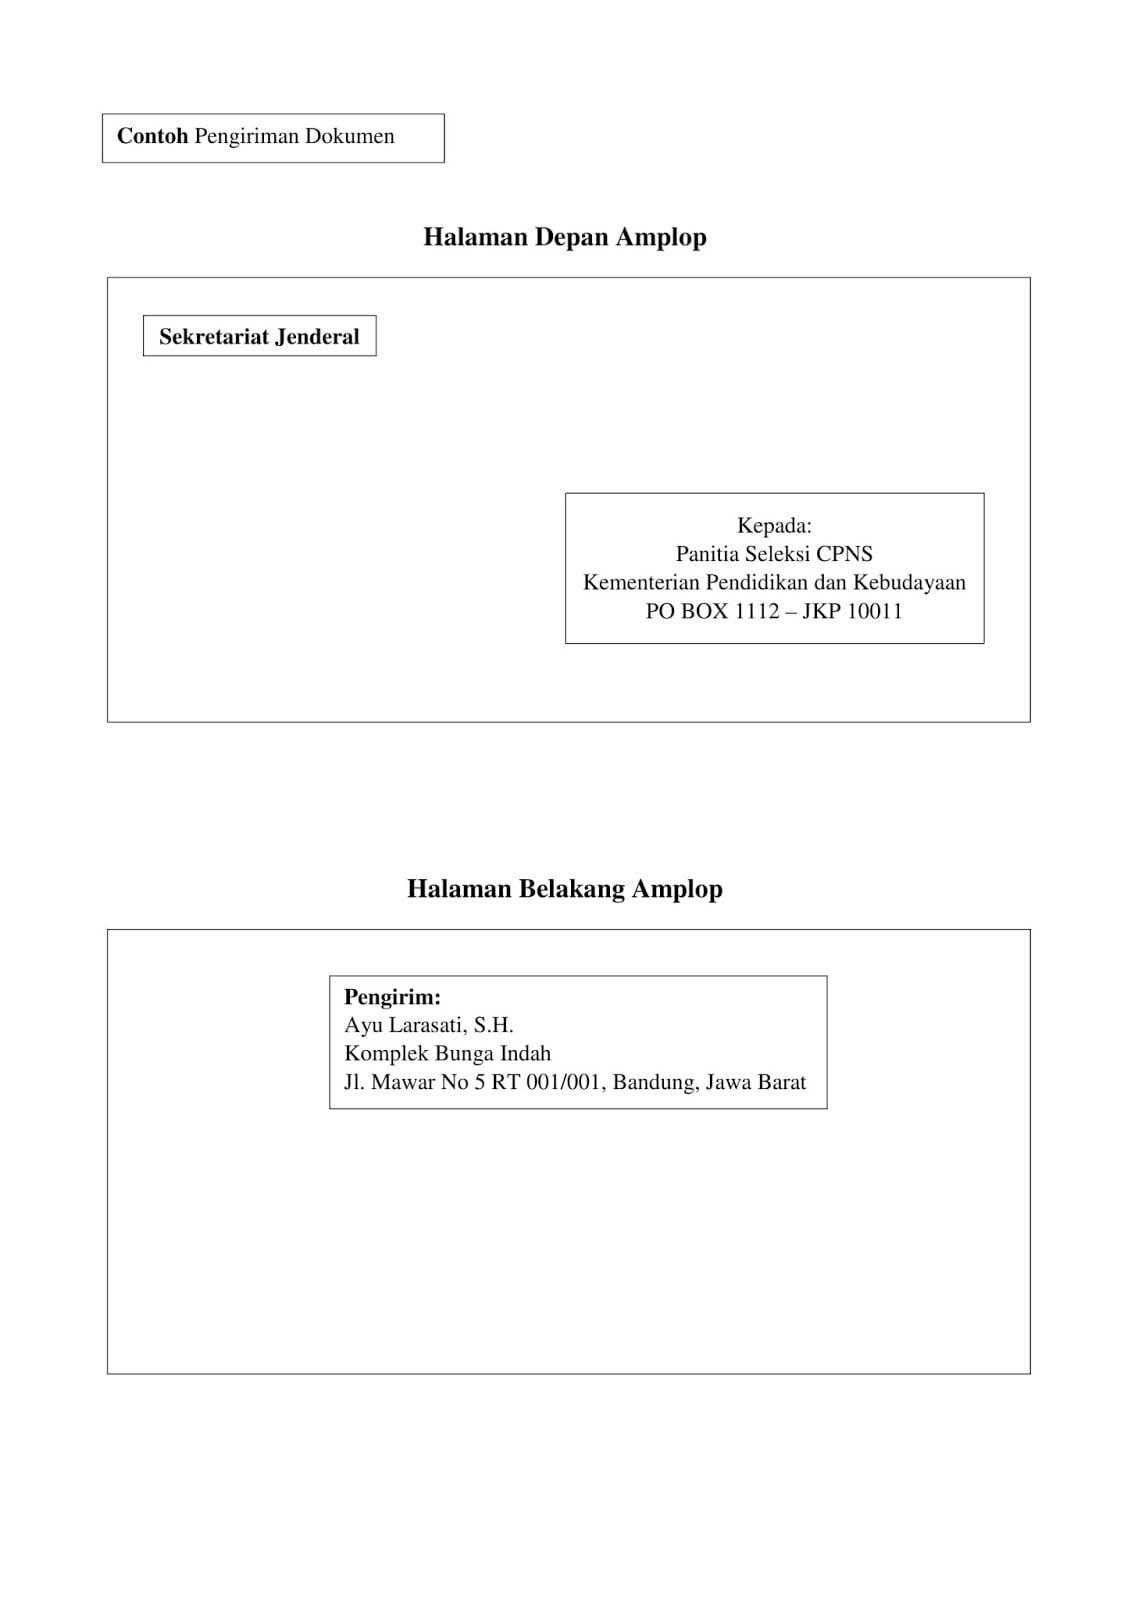 Contoh Kop Surat Kemdikbud Surat Kop Surat Desain